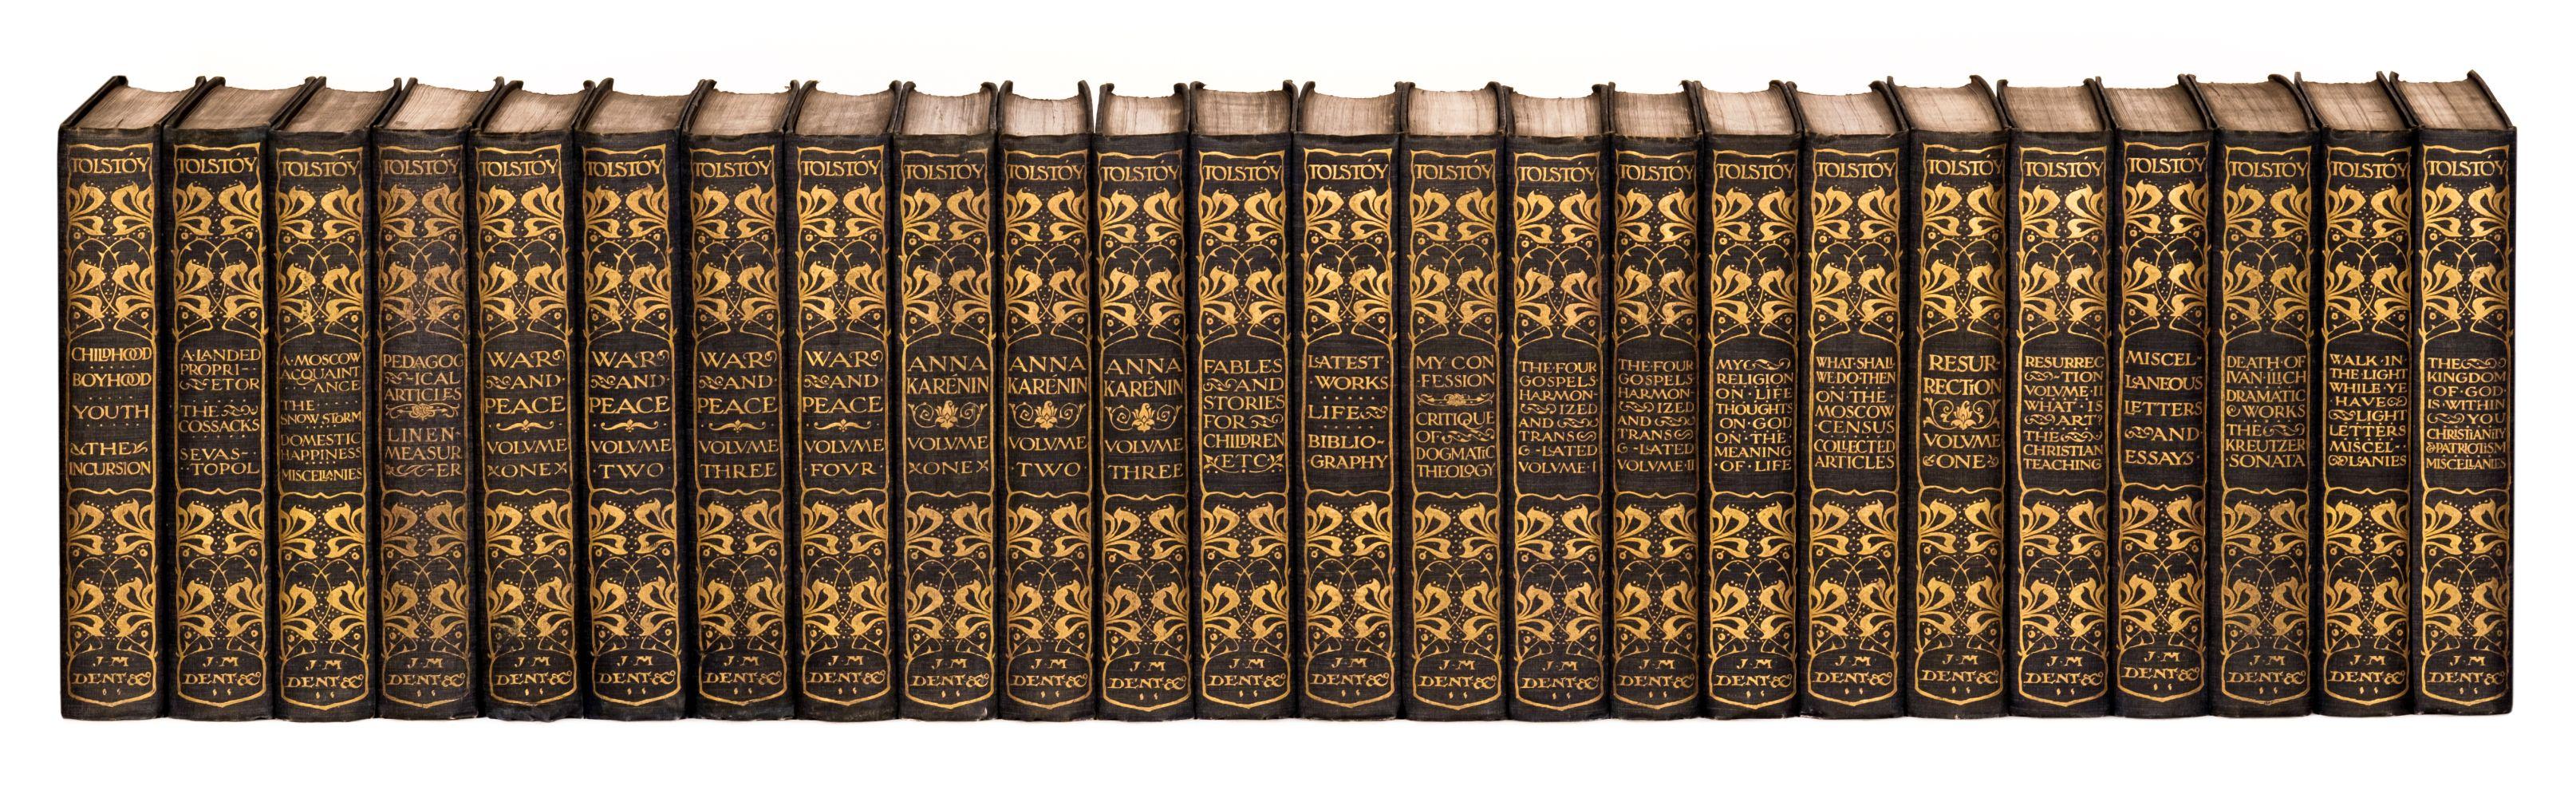 Tolstoy (Count Lev Nikolayevich). Works, 24 vols, 1904